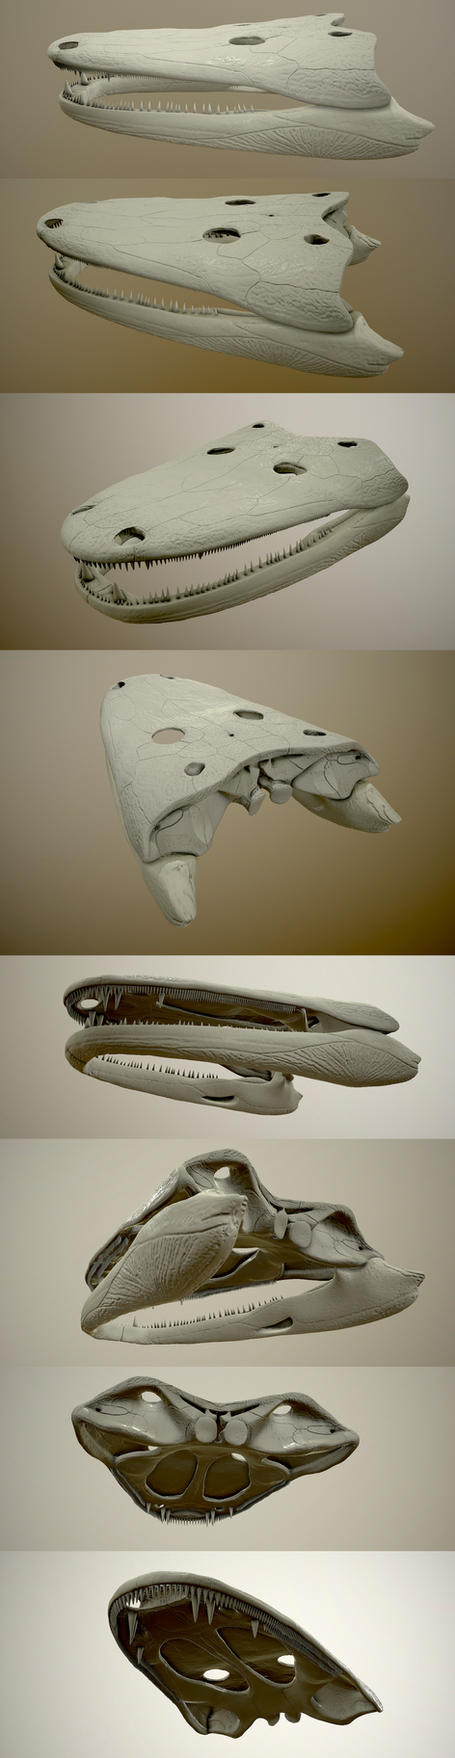 Cyclotosaurus intermedius. by AnthodonKR